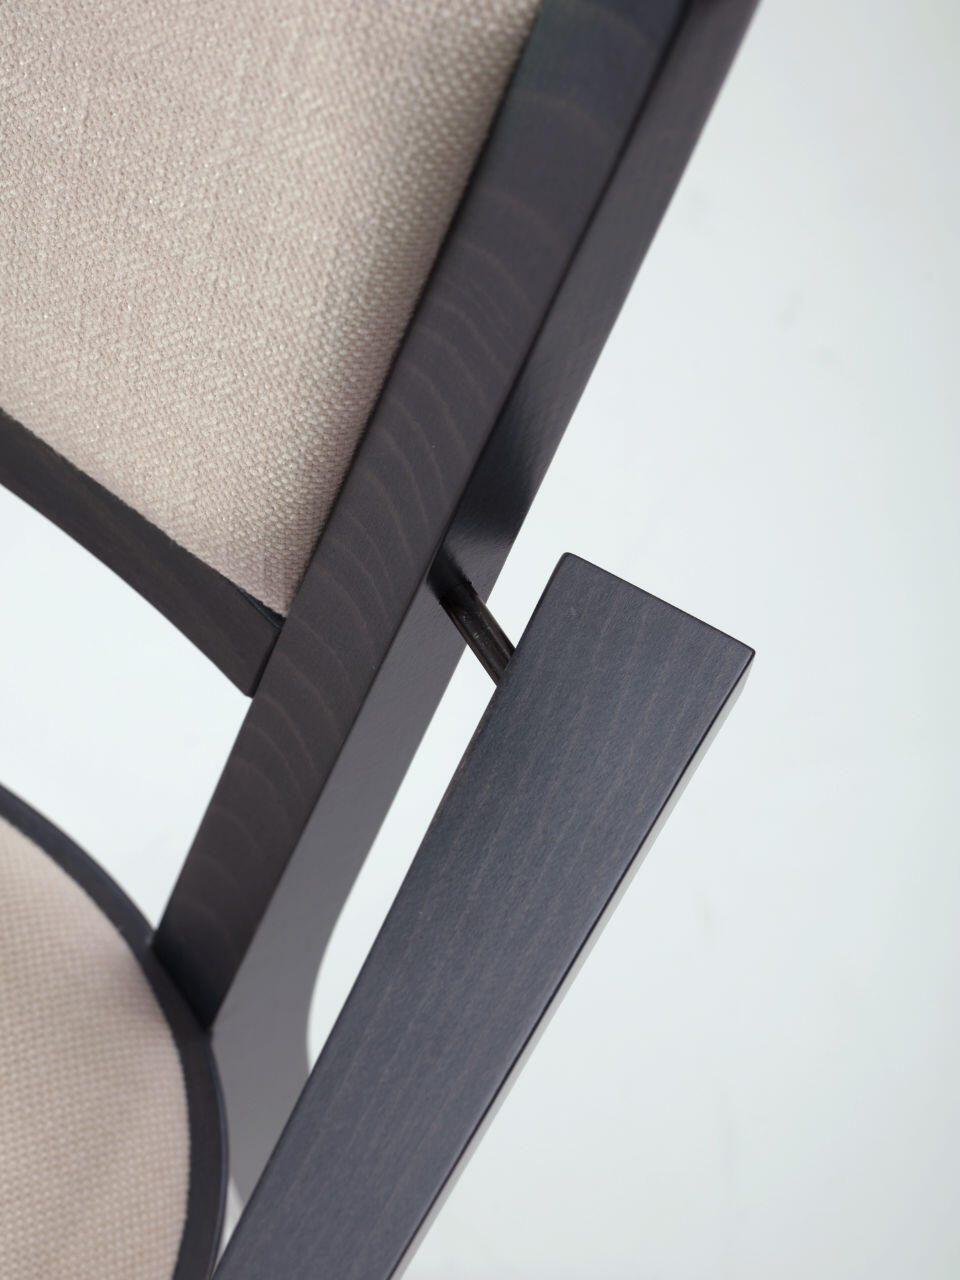 restaura_120 M armchair_01_dett 3_HR